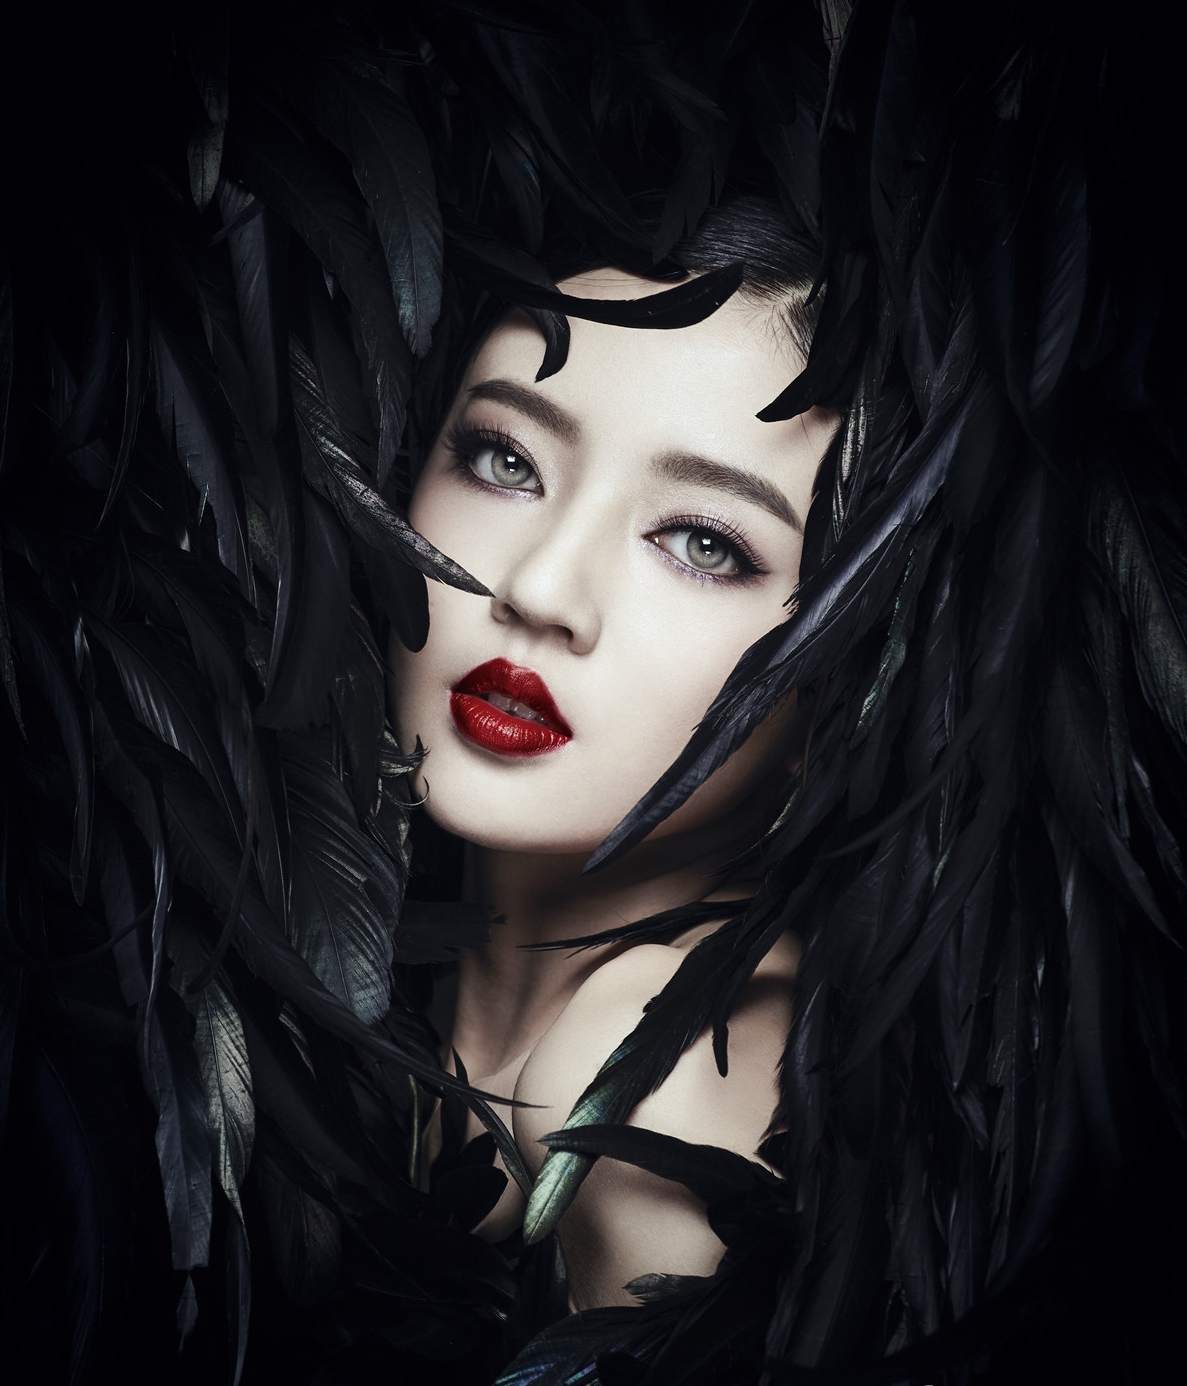 Demon girl 2016 dramapanda - Hot demon women ...